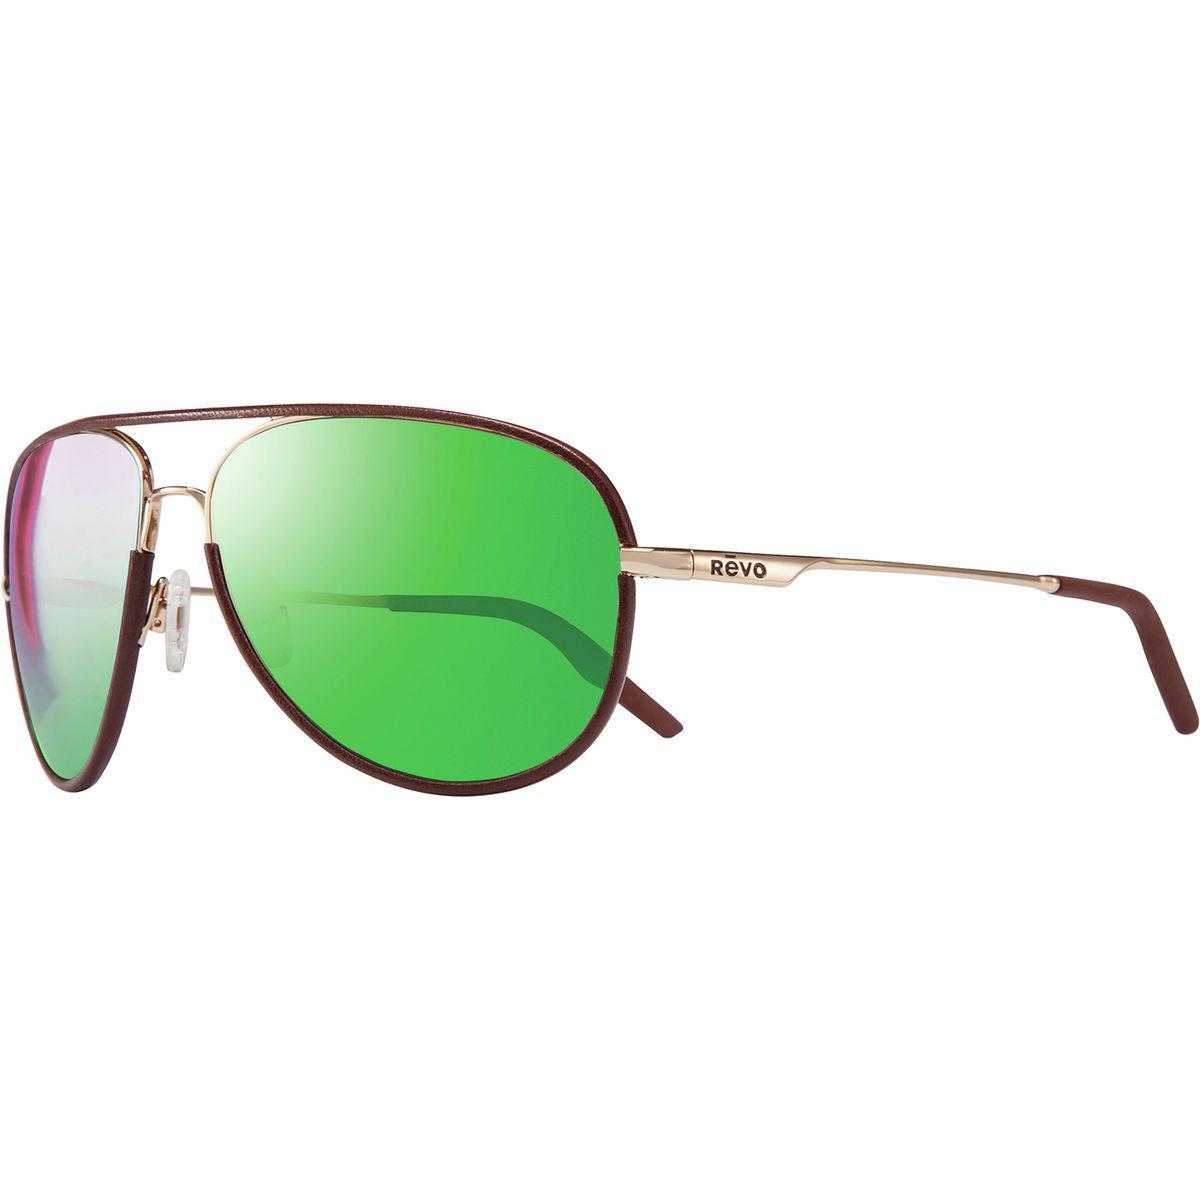 b19272f324 Revo - Green Carlisle Sunglasses - Polarized for Men - Lyst. View fullscreen